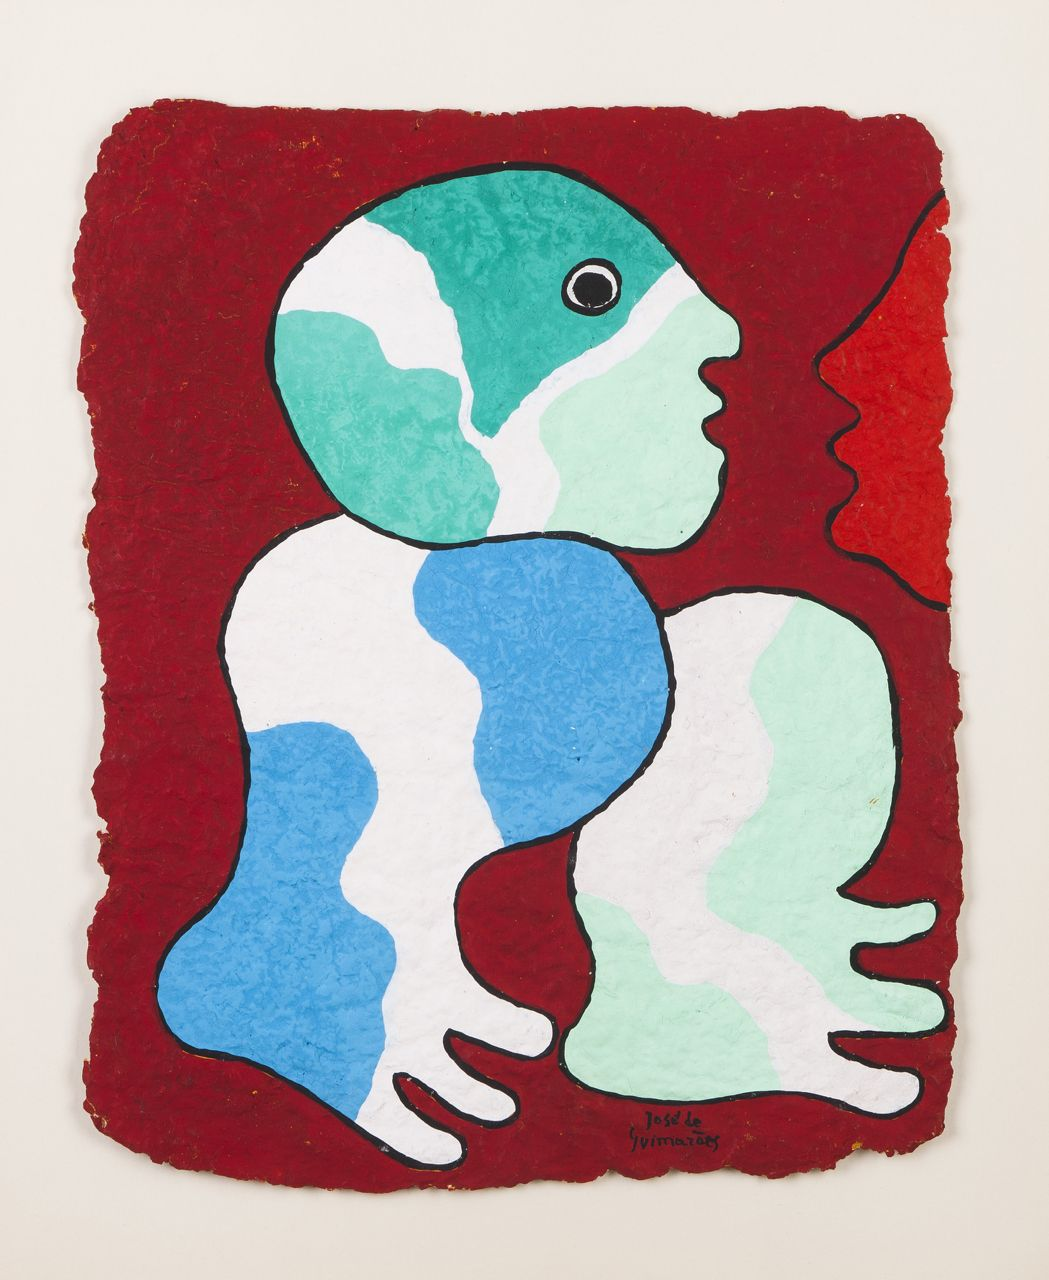 VERITAS | Art Auctioneers | Portugal : Leilão 42 - José de Guimarães - Sem título